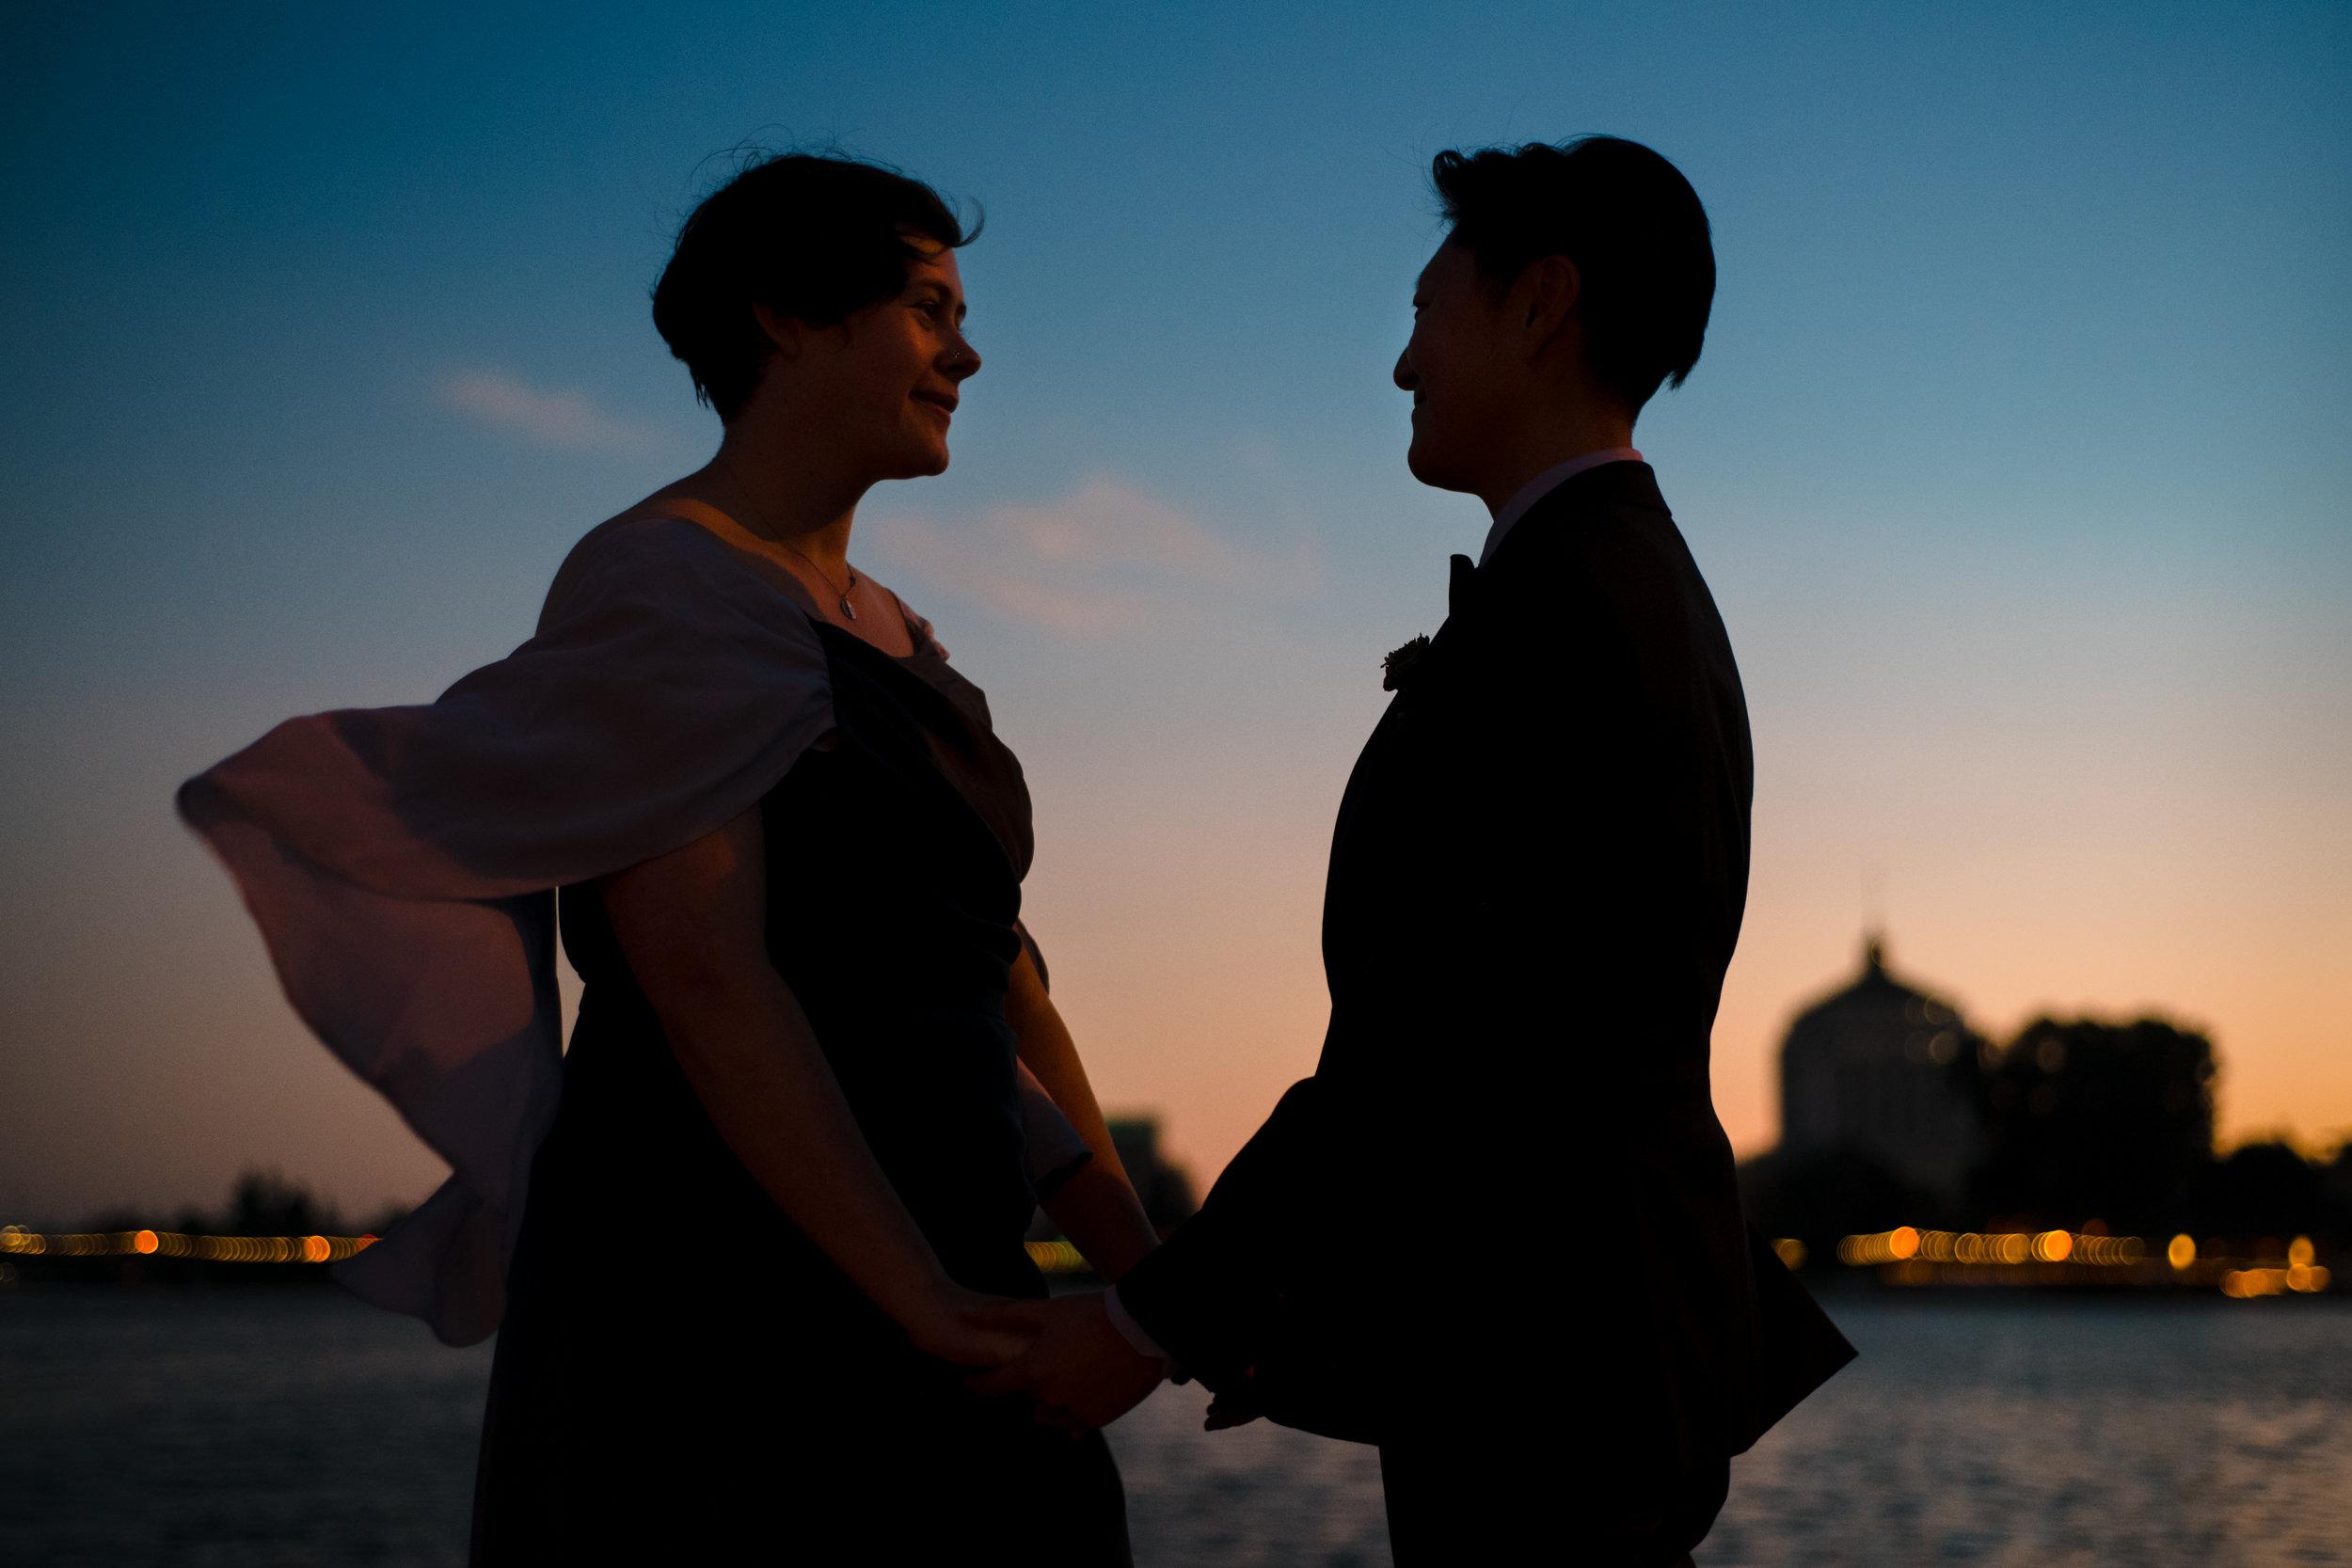 lesbian-wedding-sunset.jpg